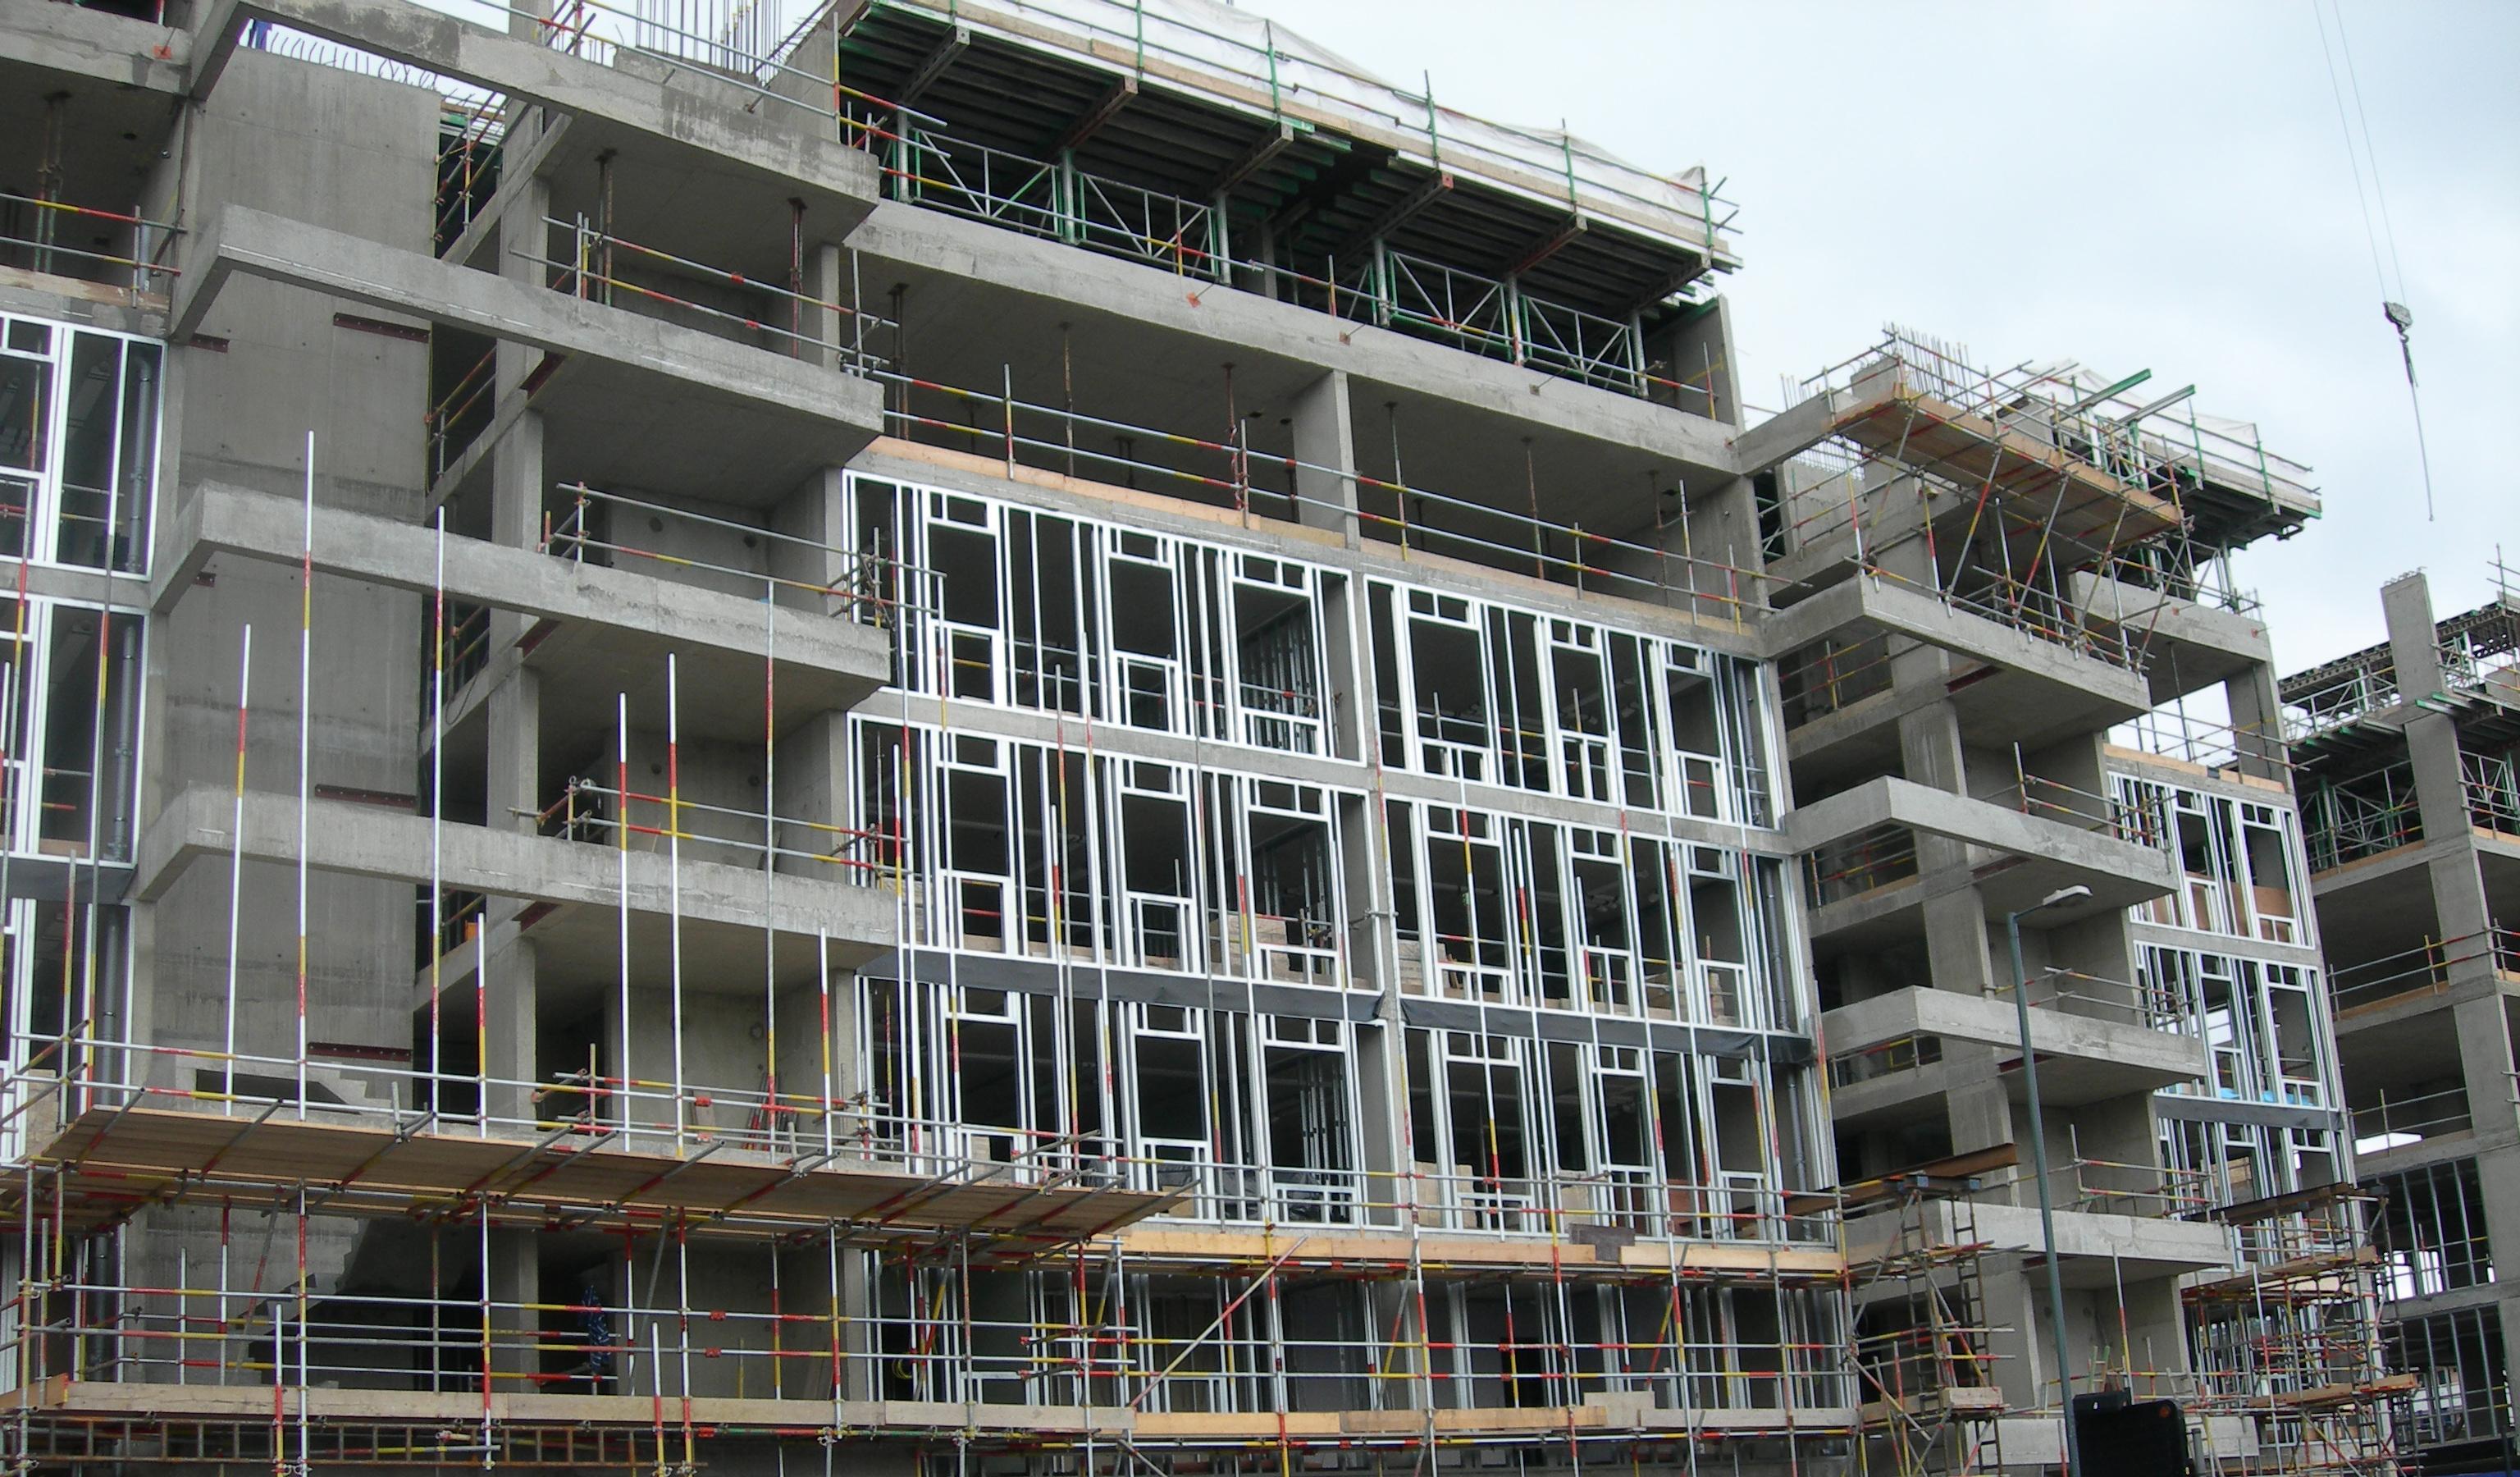 Steel Frame Infill Walling